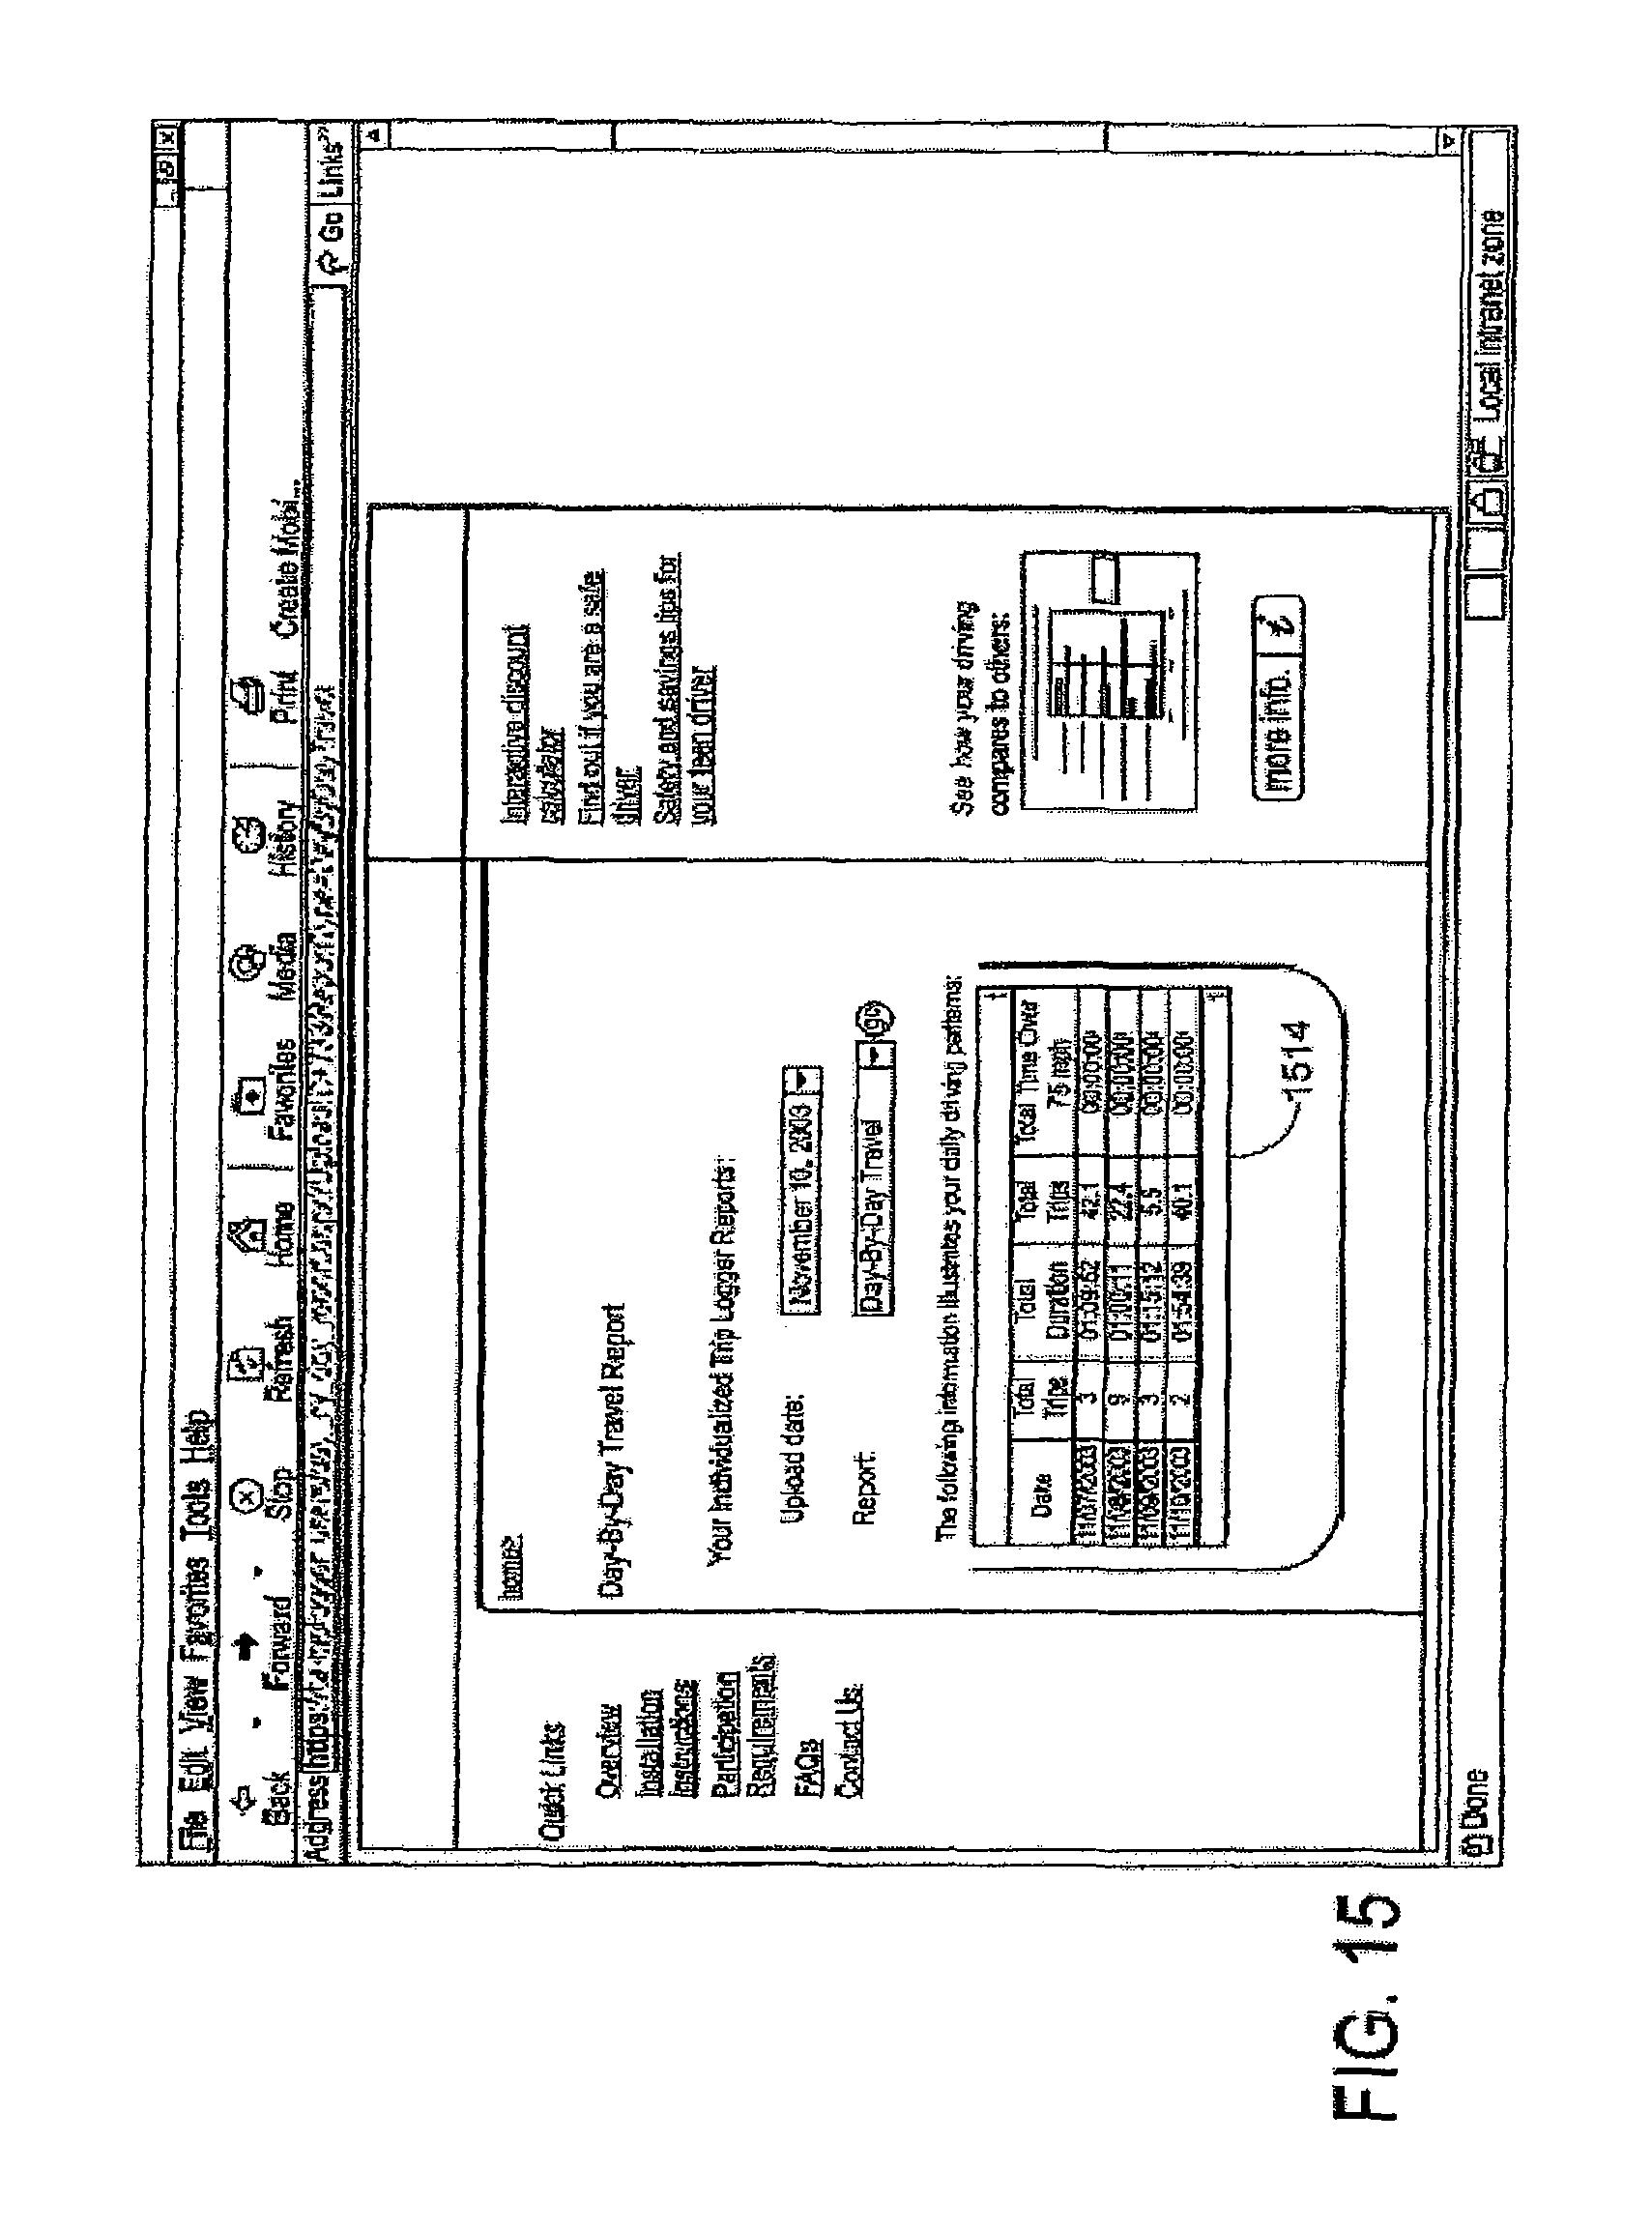 Patent US 8,311,858 B2